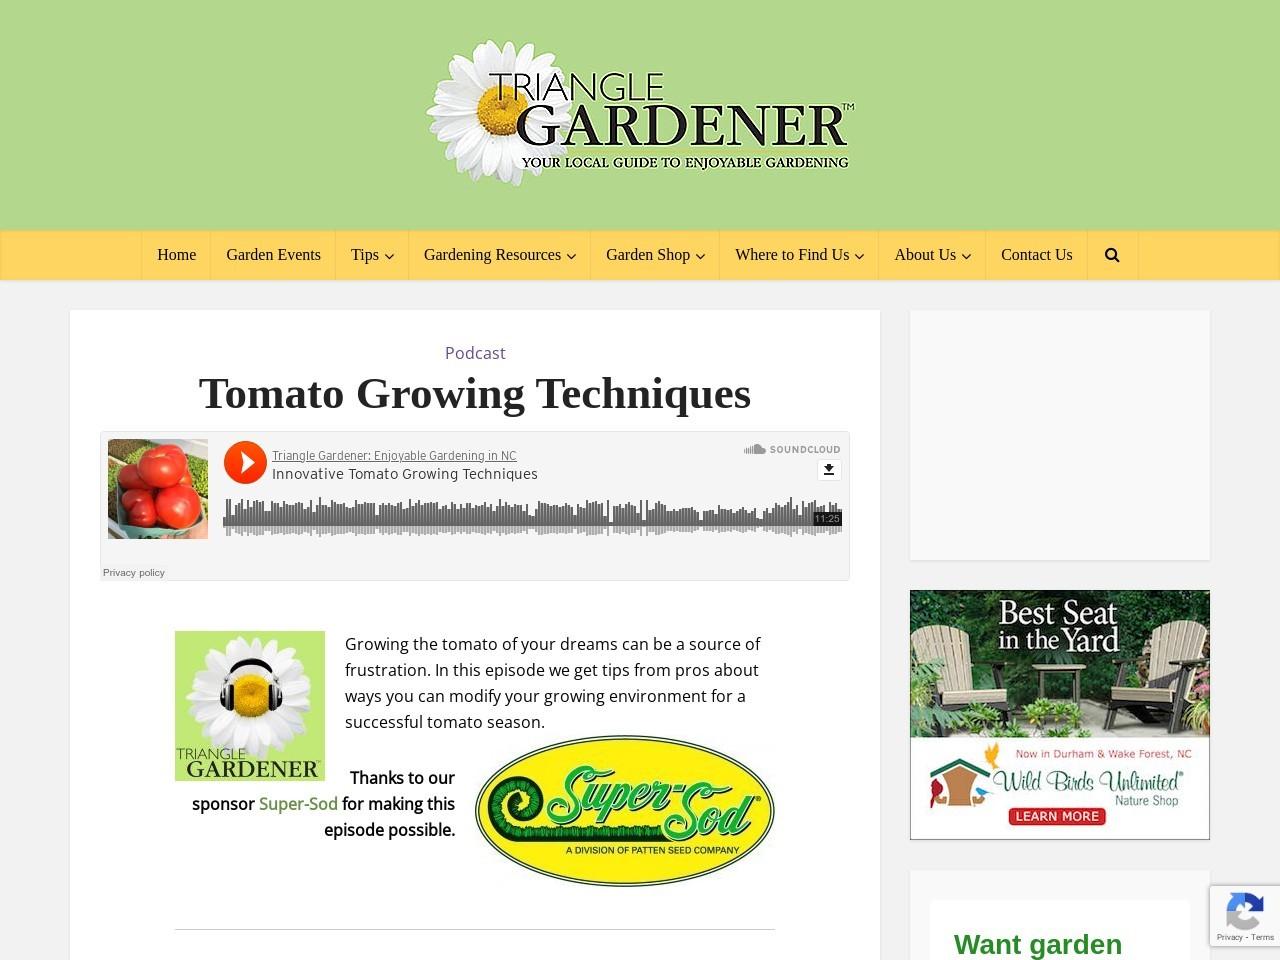 Tomato Growing Techniques